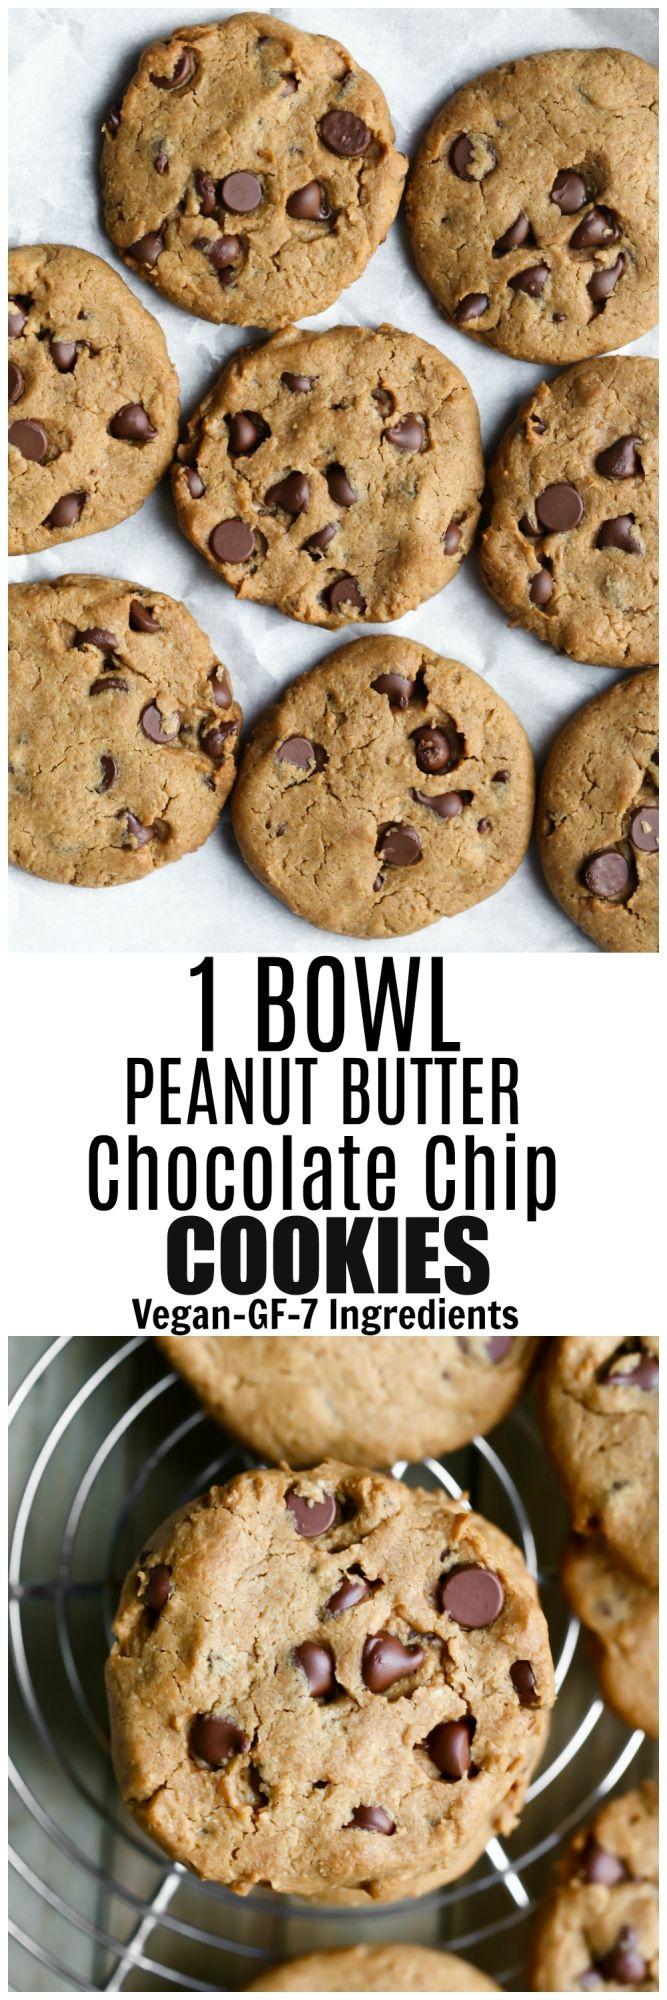 Vegan Peanut Butter Chocolate Chip Cookies Gluten Free Recipe Gluten Free Peanut Butter Vegan Cookies Vegan Dessert Recipes